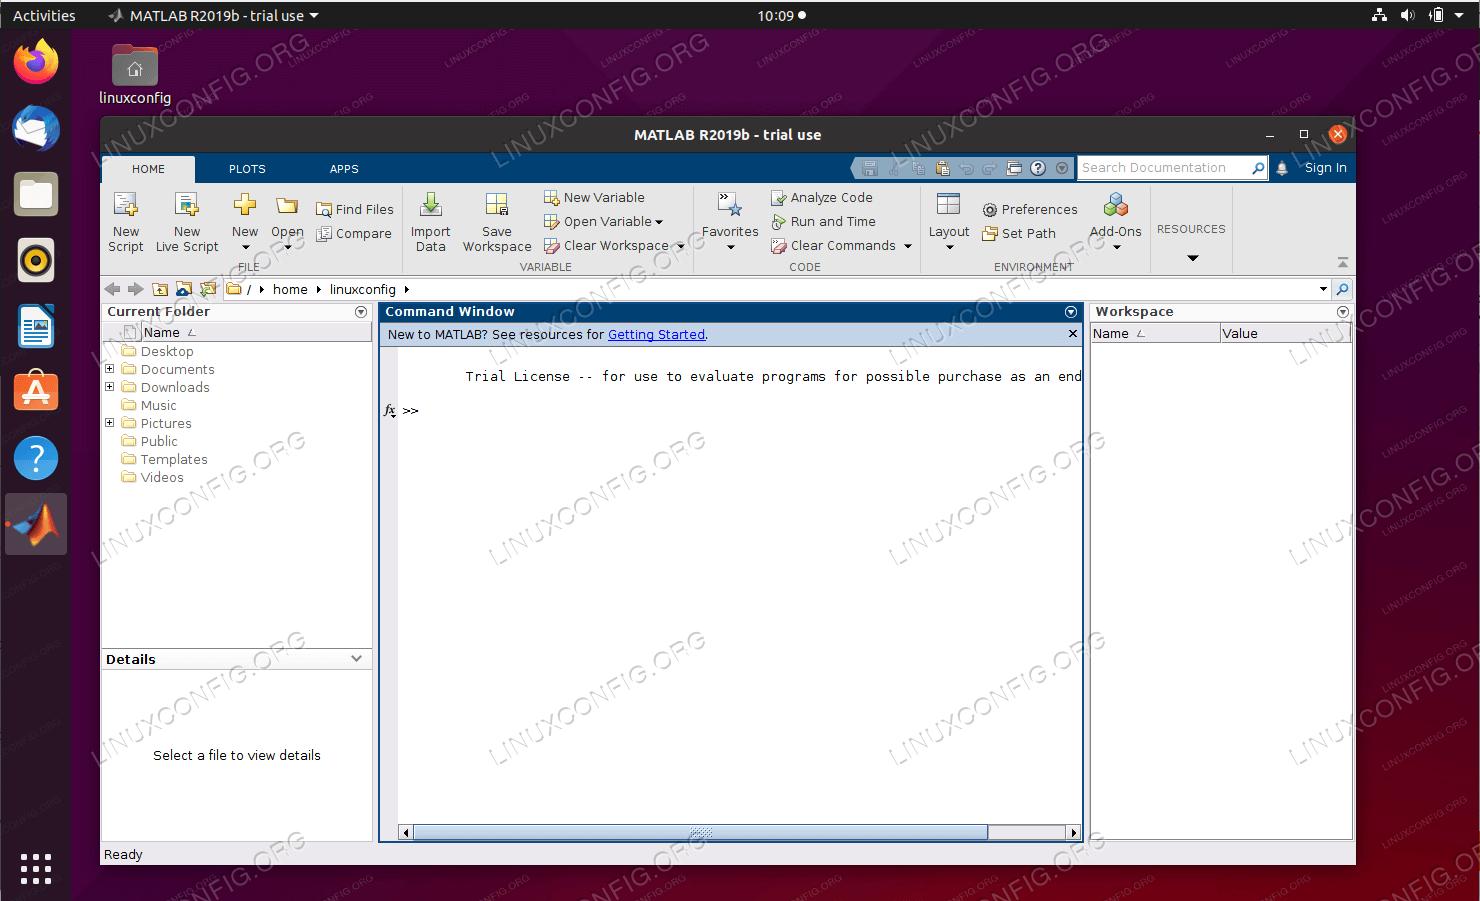 How to install MATLAB on Ubuntu 20.04 Focal Fossa Linux